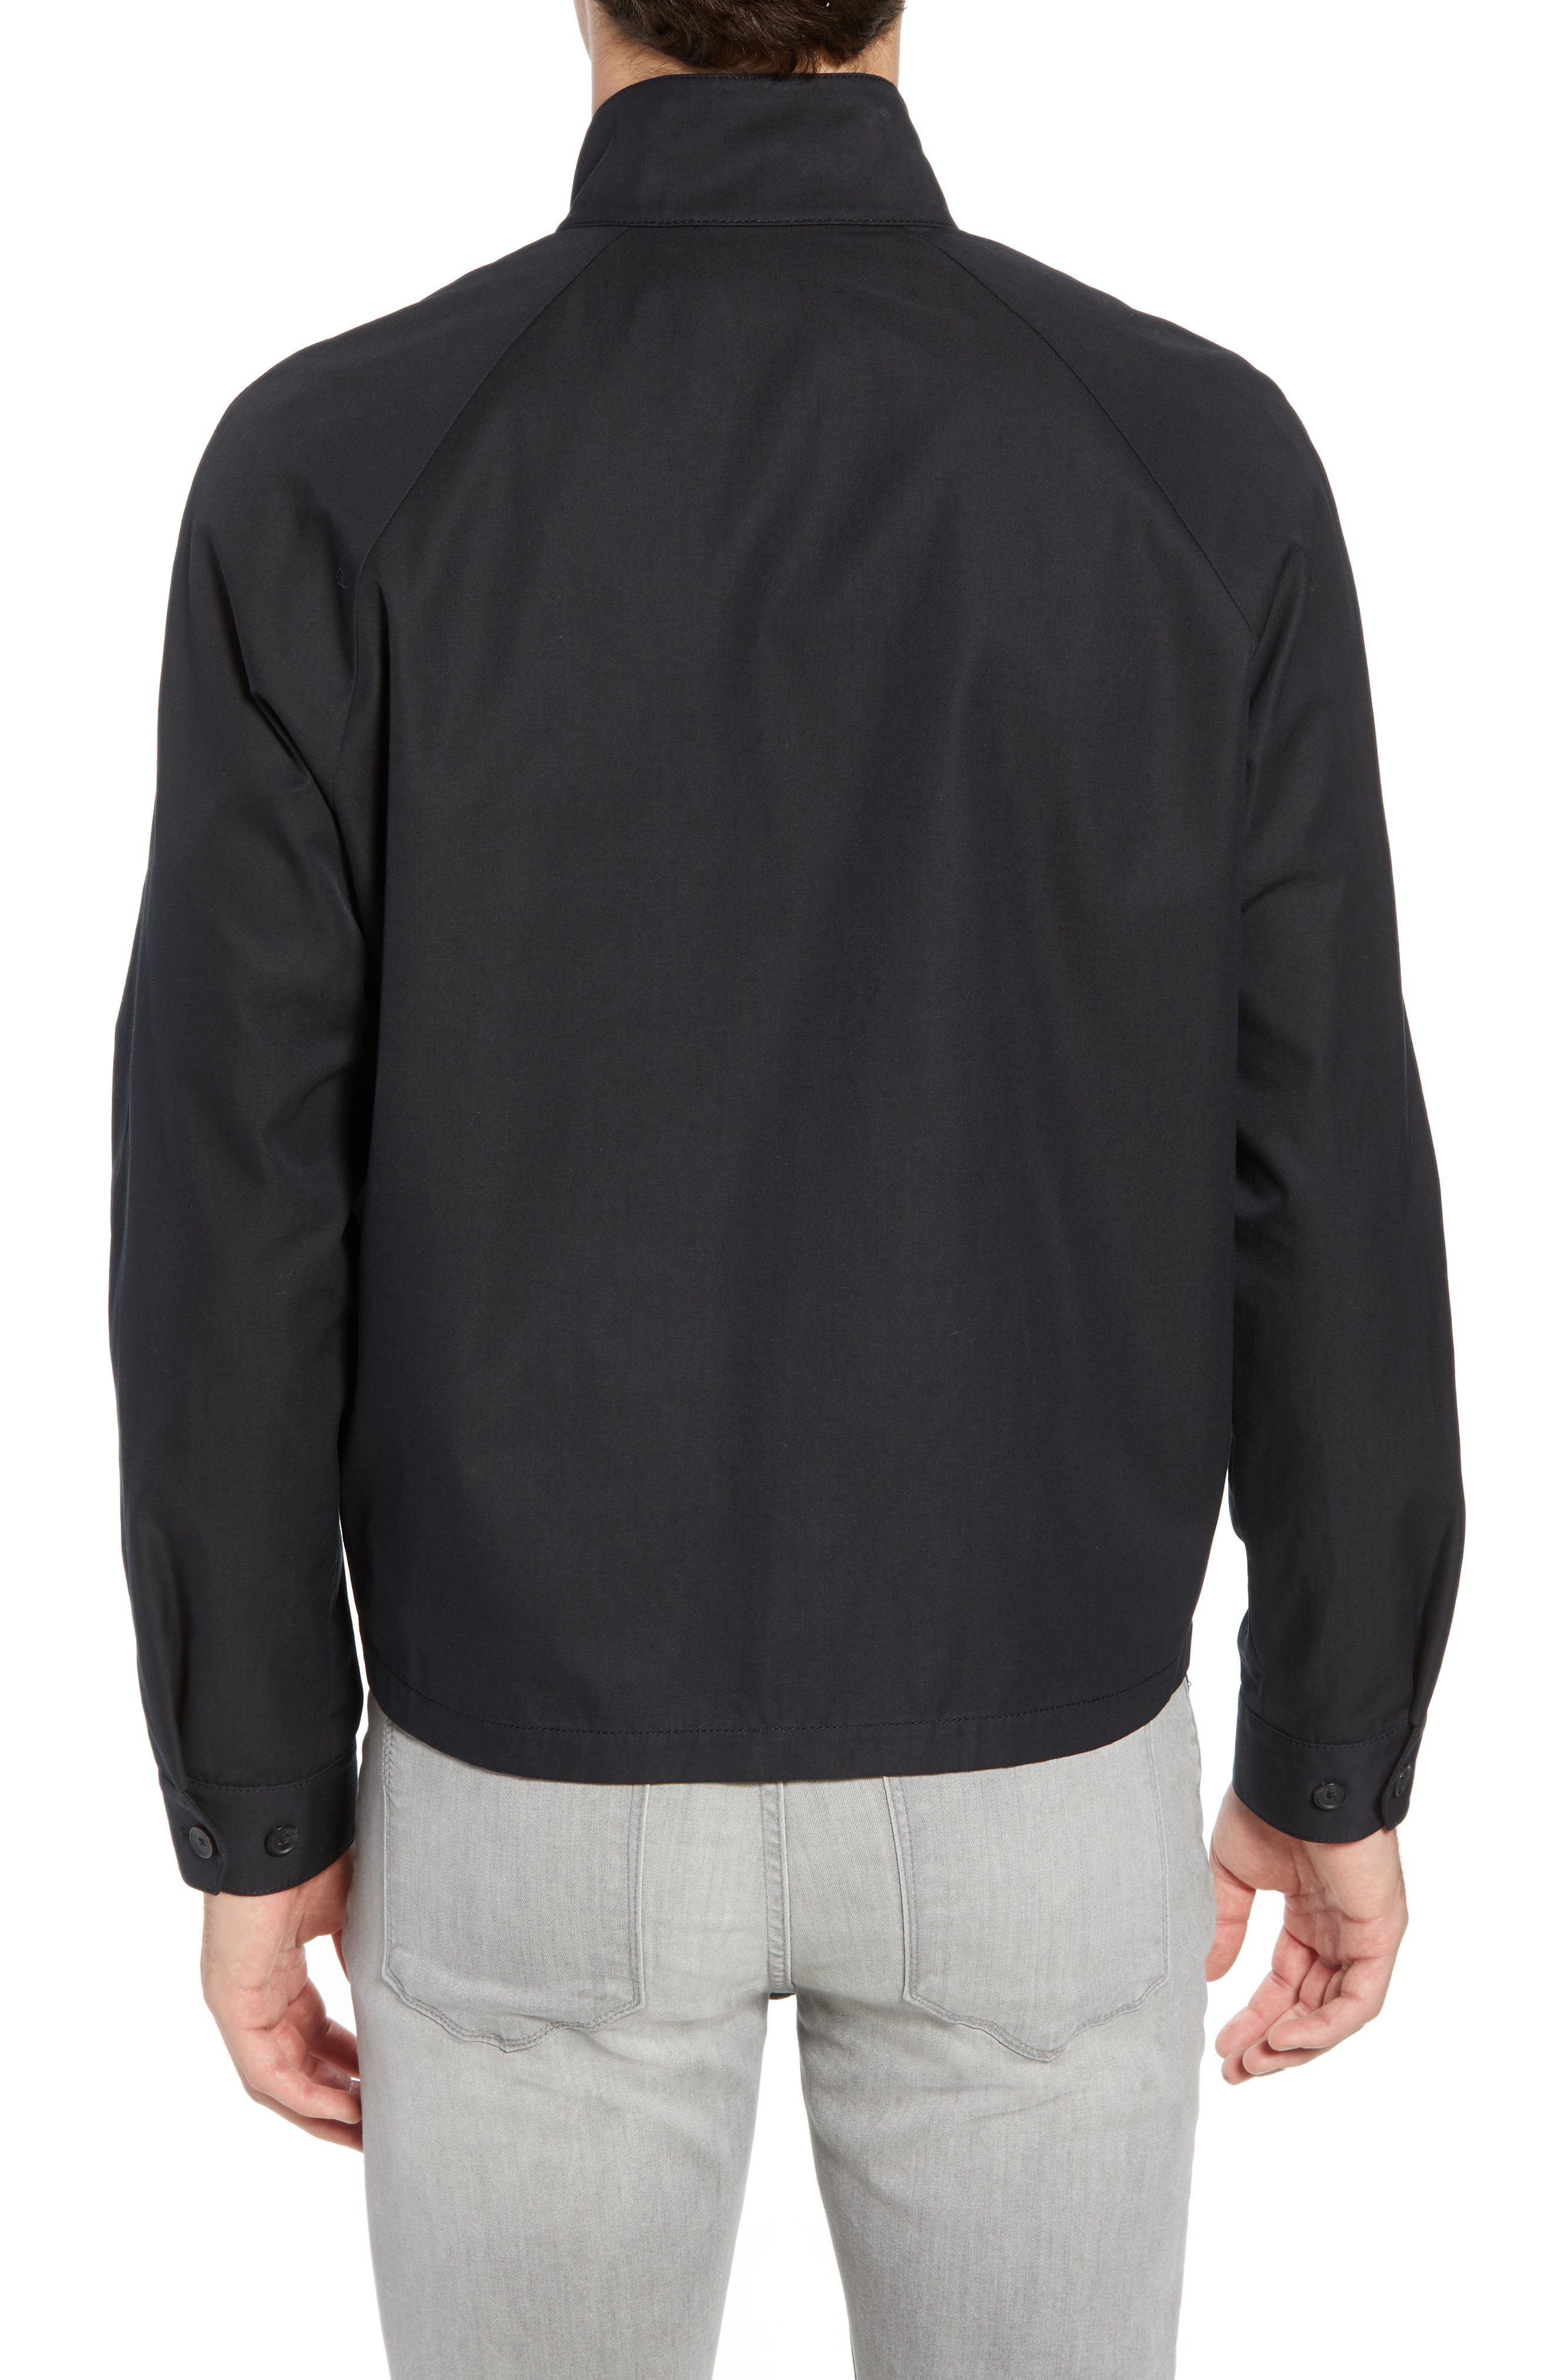 Regular Fit Jacket,                             Alternate thumbnail 2, color,                             Black